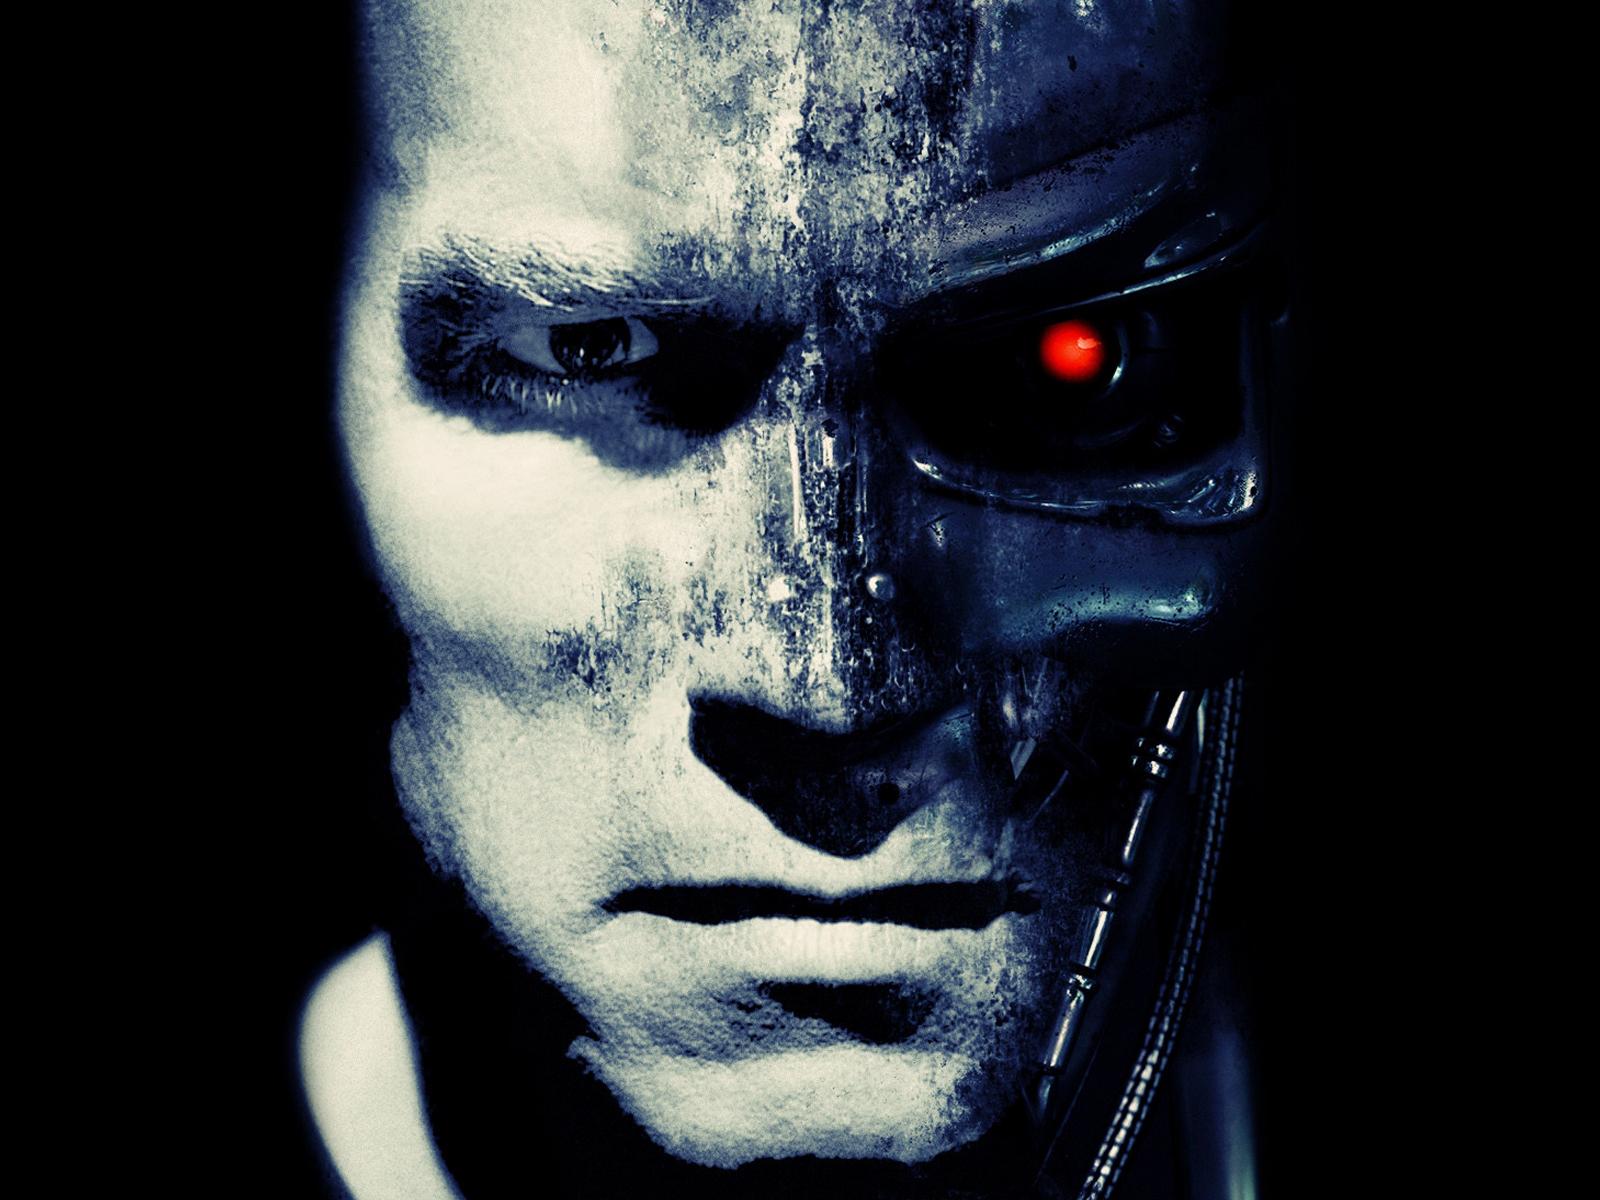 15753 Screensavers and Wallpapers Robots for phone. Download Cinema, People, Actors, Men, Robots, Arnold Schwarzenegger, Terminator pictures for free